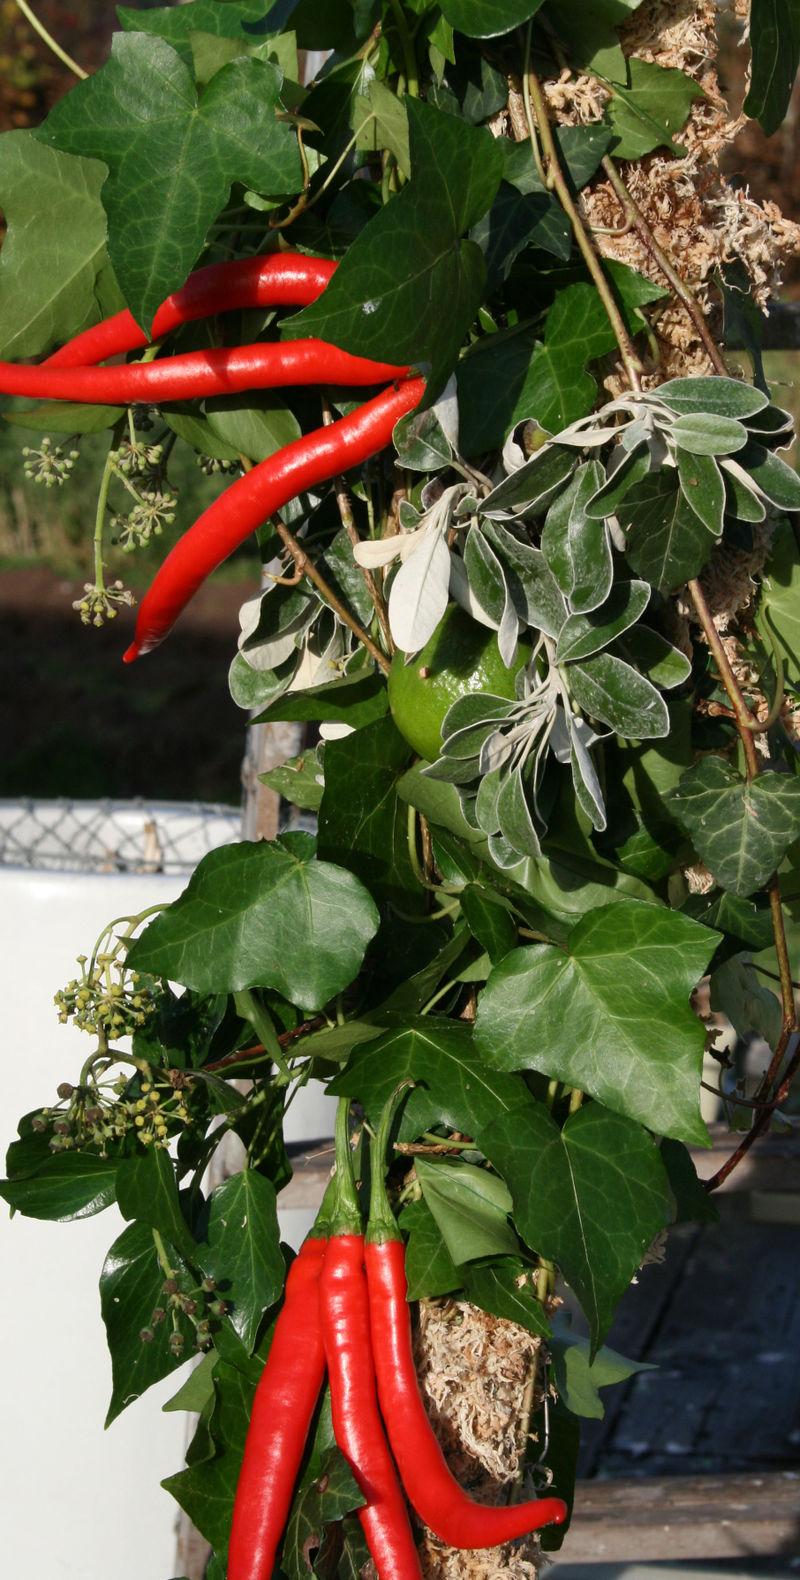 Chillies in garland